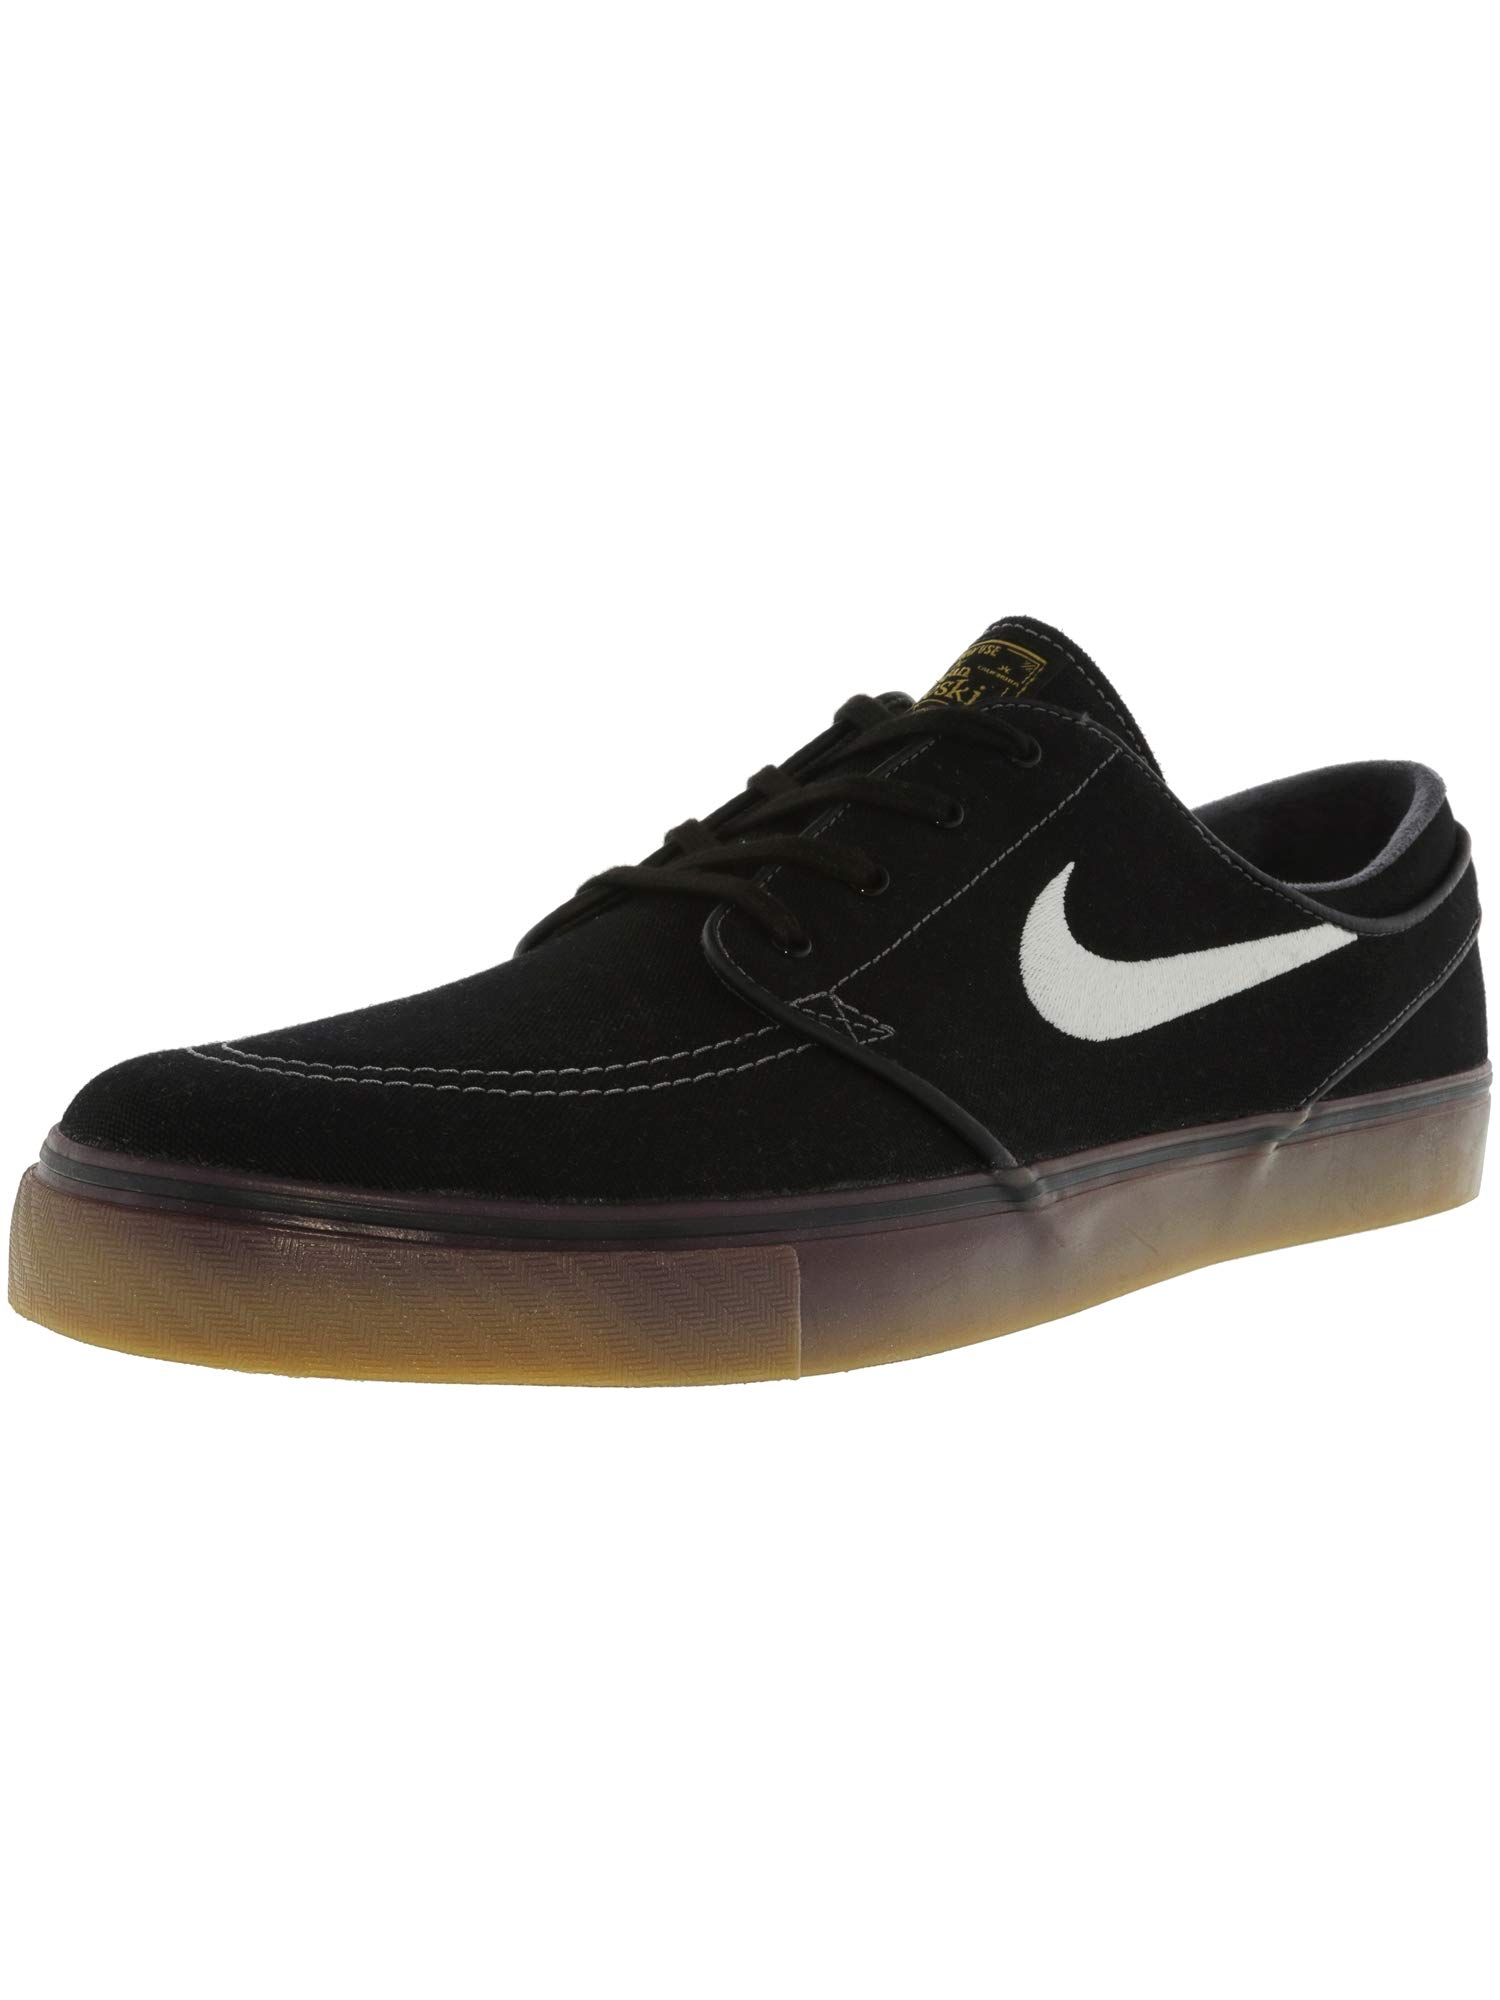 on sale 54c71 17a32 Galleon - Nike Mens Zoom Stefan Janoski Cnvs Skate Shoe Blk White Mtllc  Gld Gm Lght Br 8 D(M) US